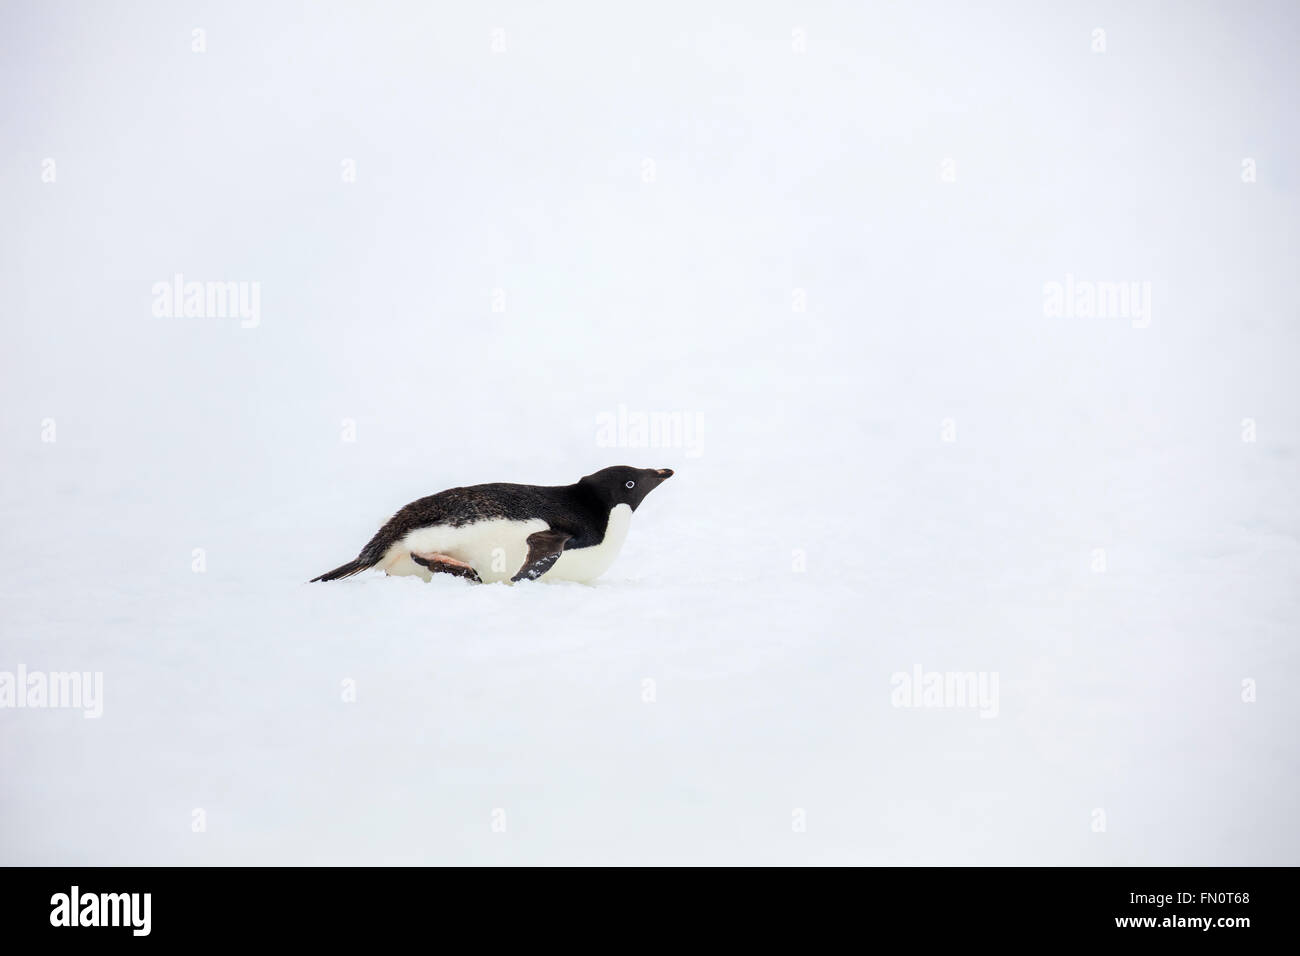 Antarctica, Antarctic peninsula, Petermann Island, Adelie penguin, - Stock Image